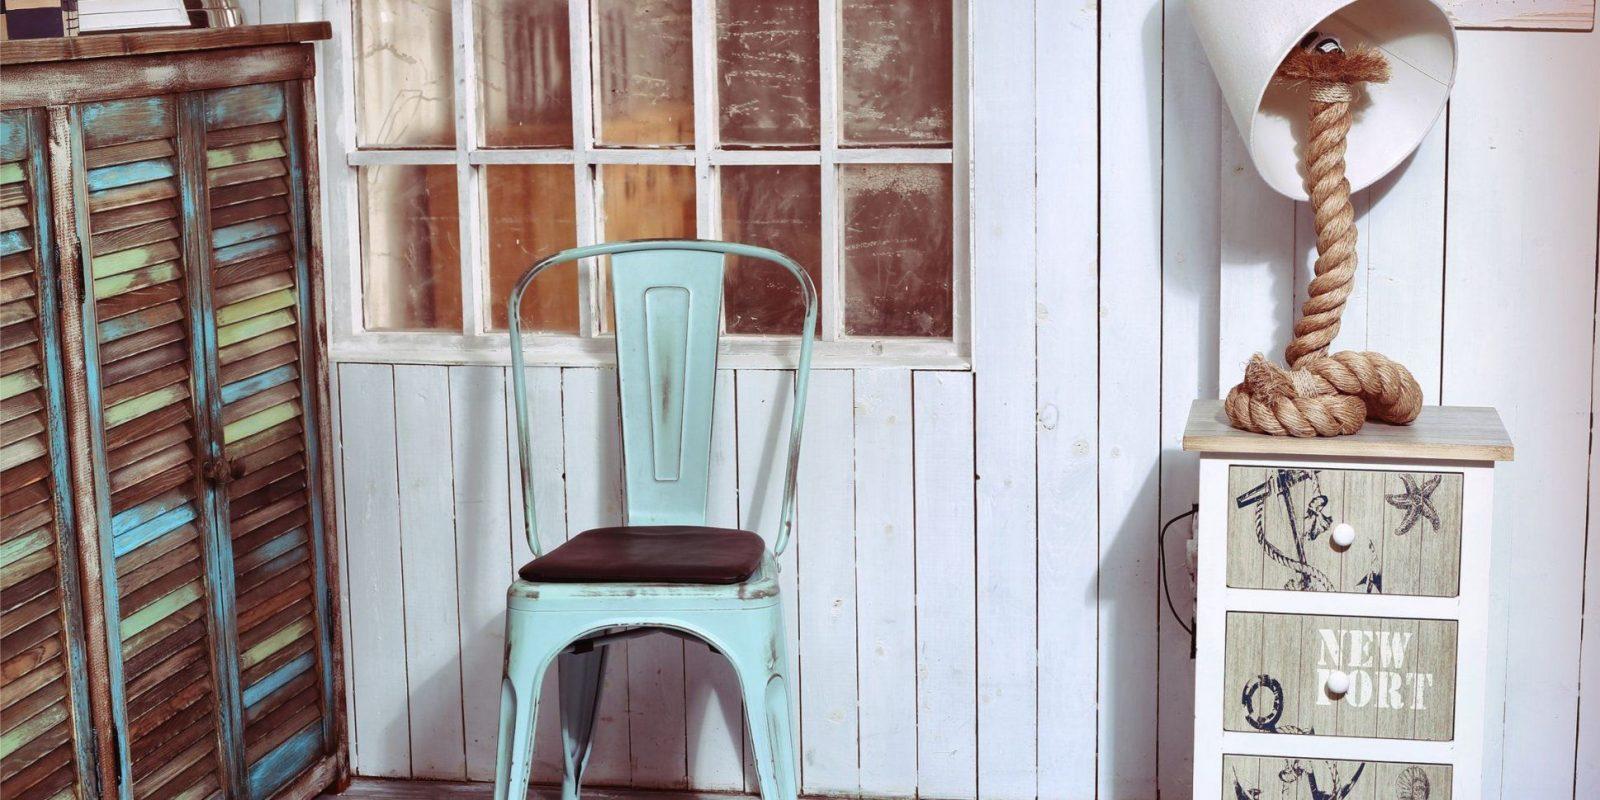 Stühle Shabby Chic Selber Machen Hg68 – Hitoiro von Stühle Shabby Chic Selber Machen Bild